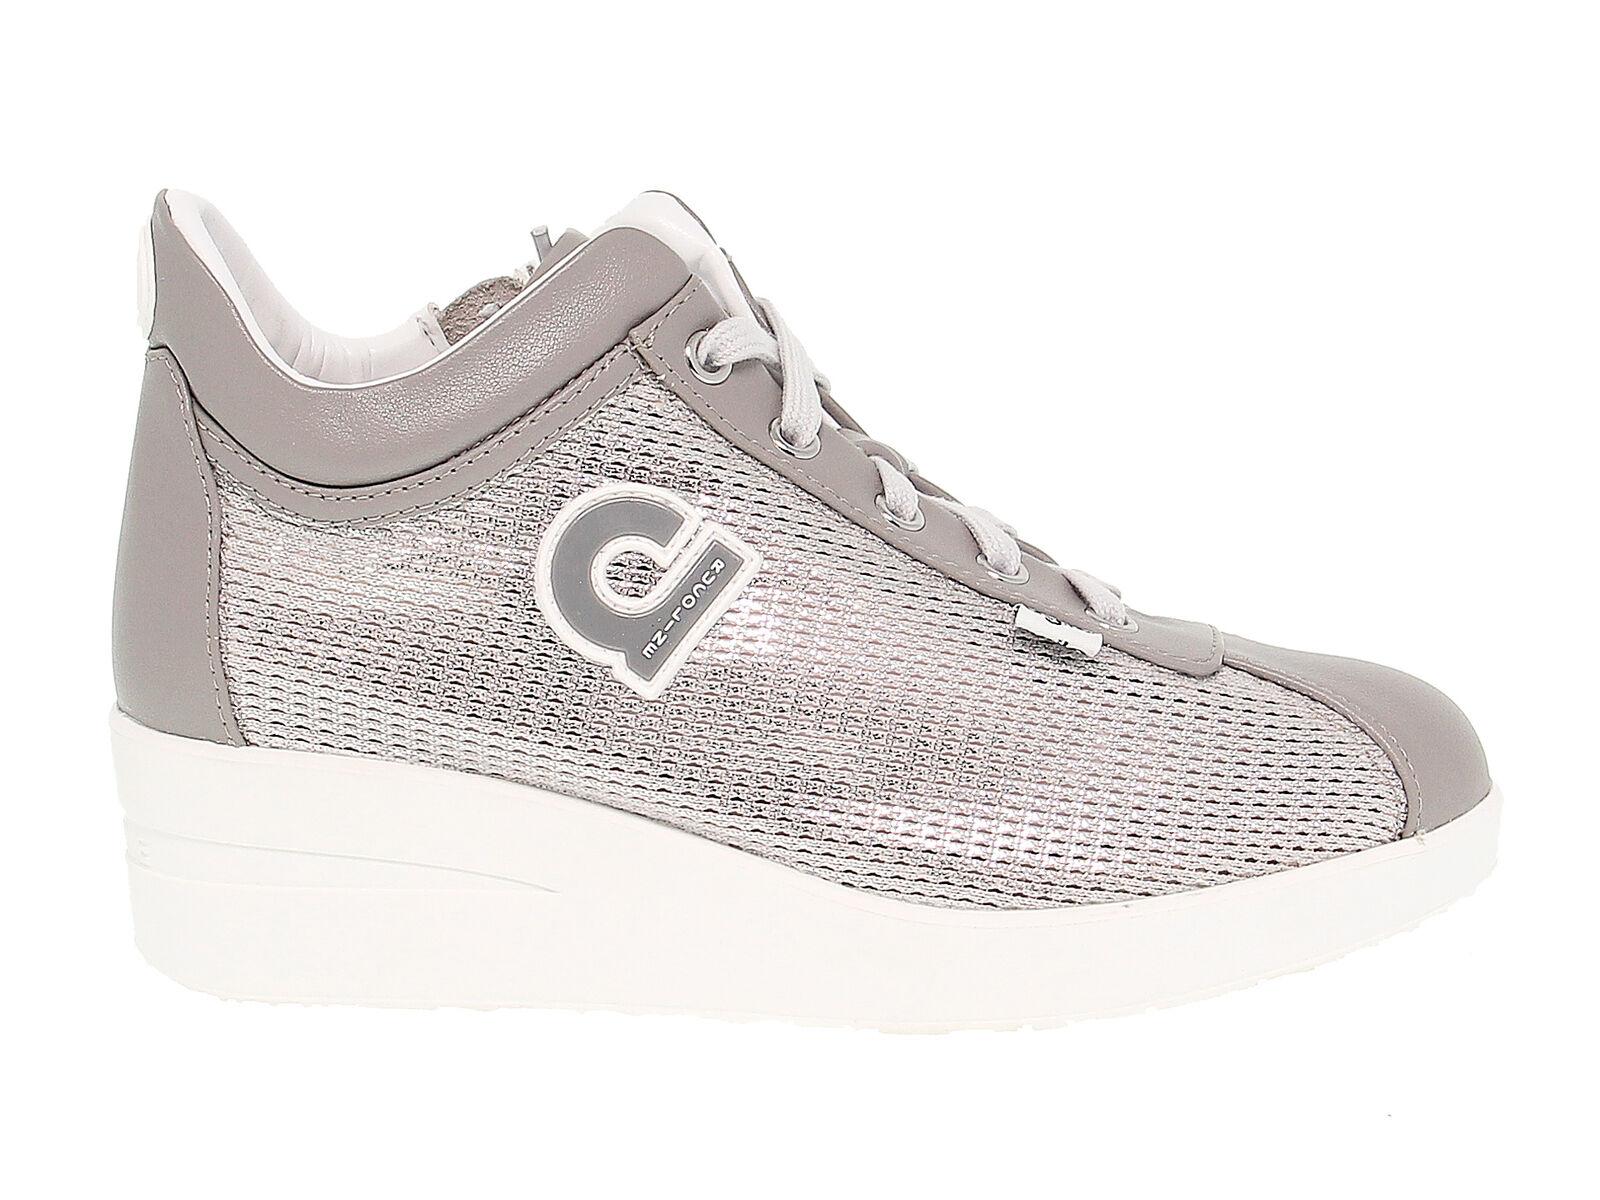 Turnschuhe RUCO LINE 226 AG in metallo micro - Schuhe Damen